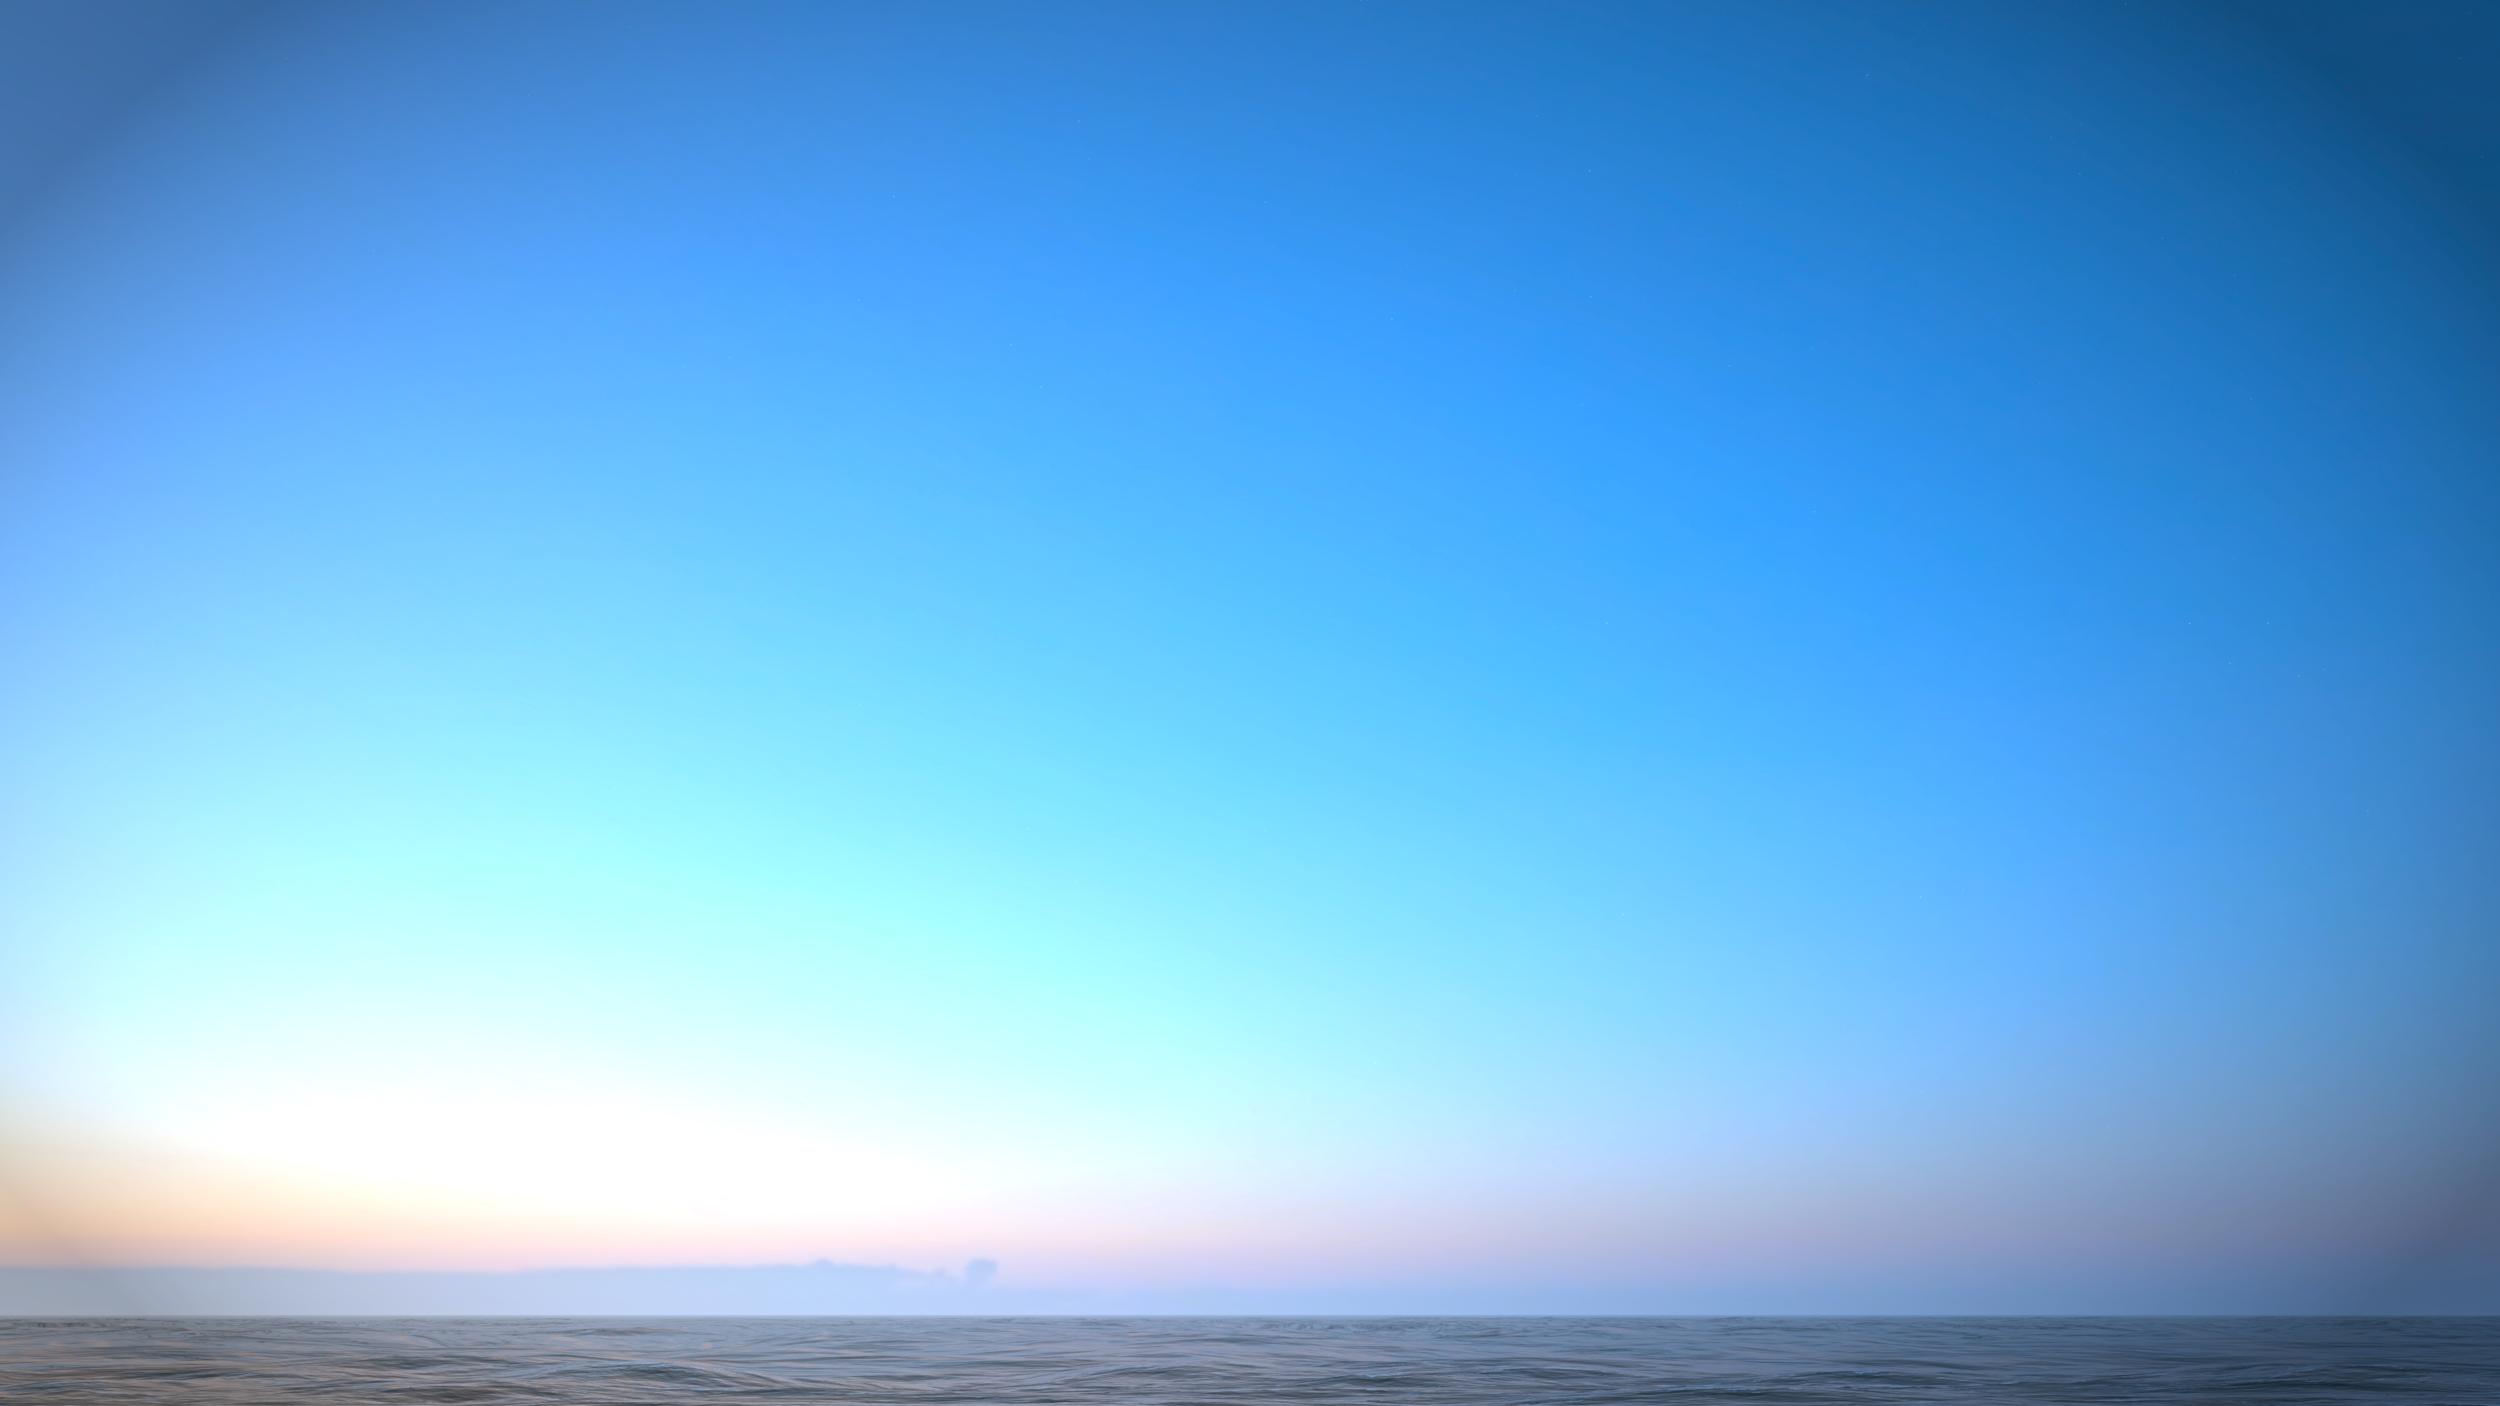 Forza Horizon 4 2019-01-10 11-16-27.png